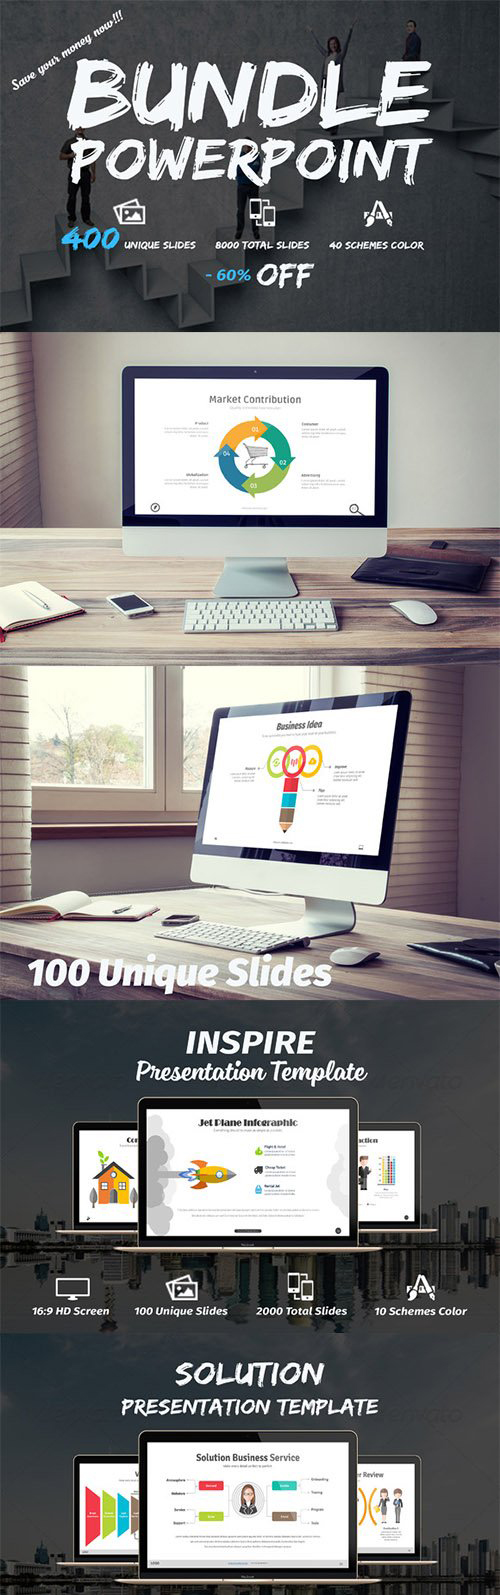 Creativemarket BUNDLE Powerpoint Template 323156